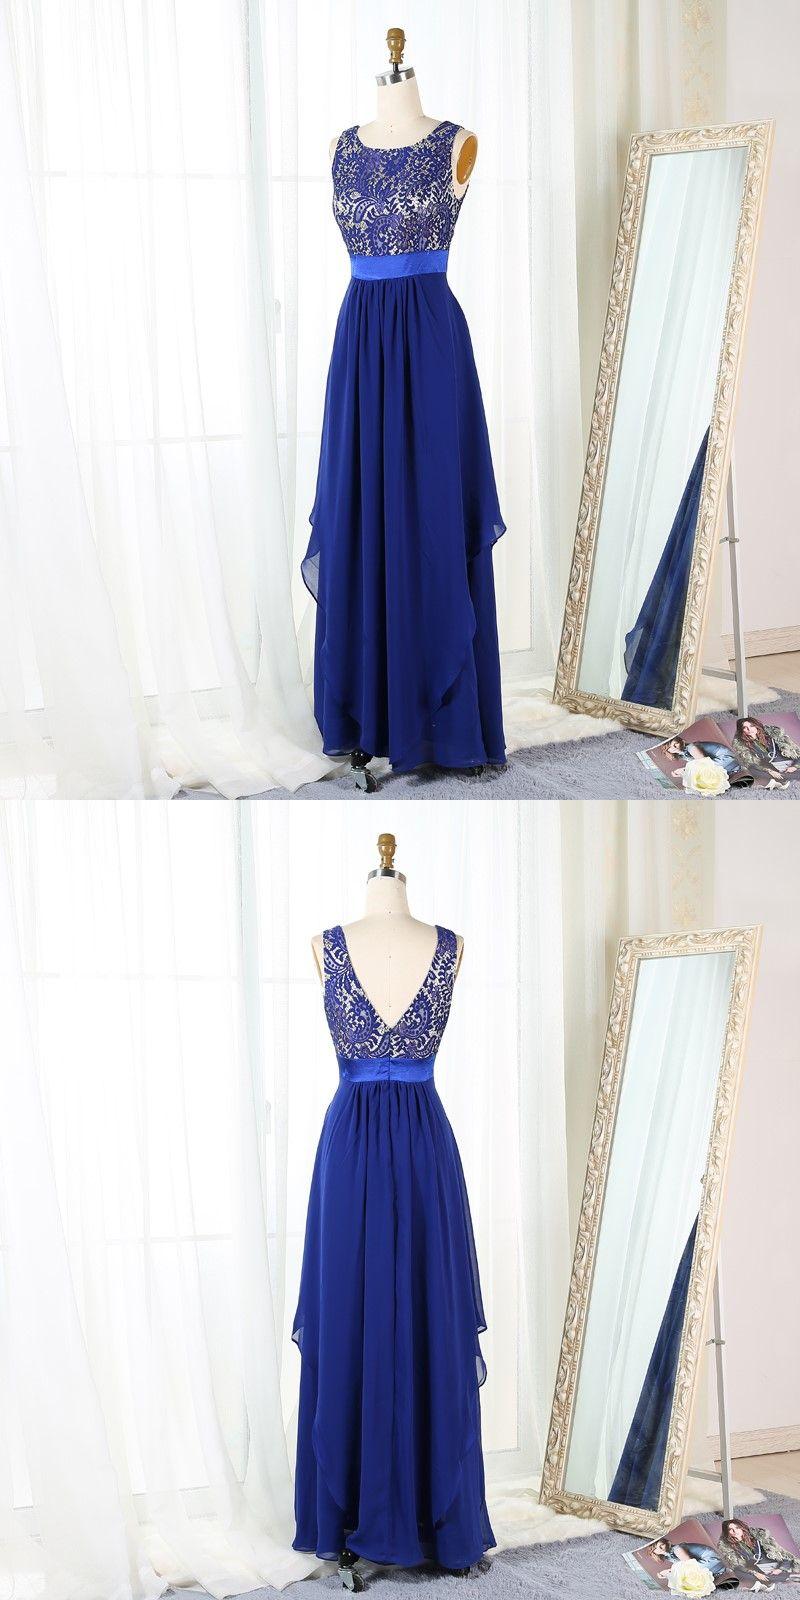 Aline bateau floorlength royal blue chiffon prom dress with lace